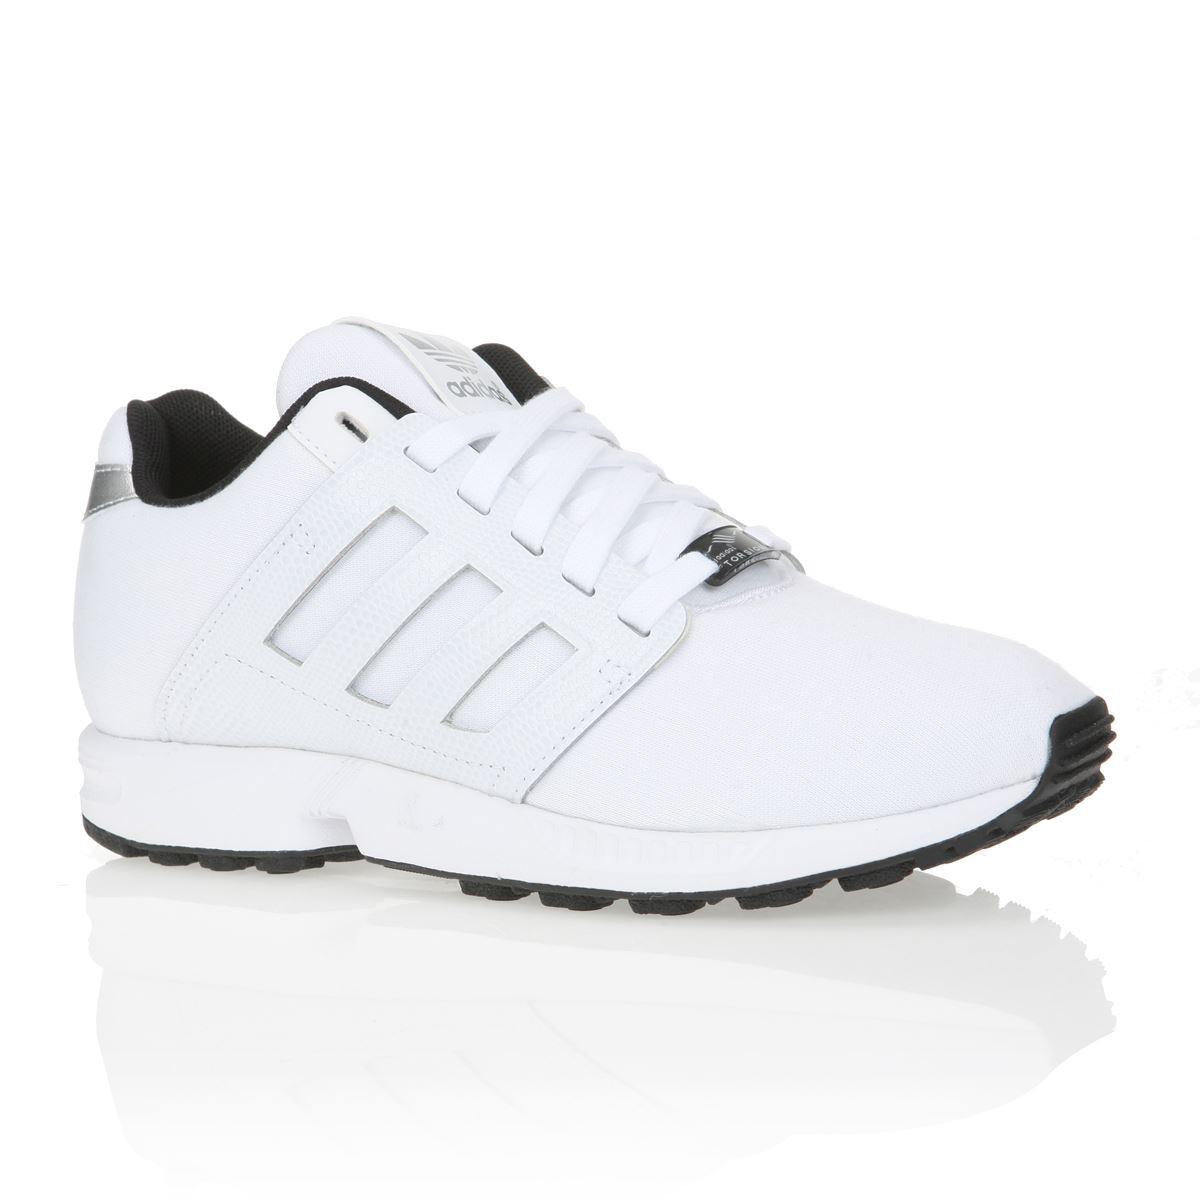 Adidas Acheter Chaussures Cher Baskets Flux Pas Originals Femme Zx rHnrWRqS